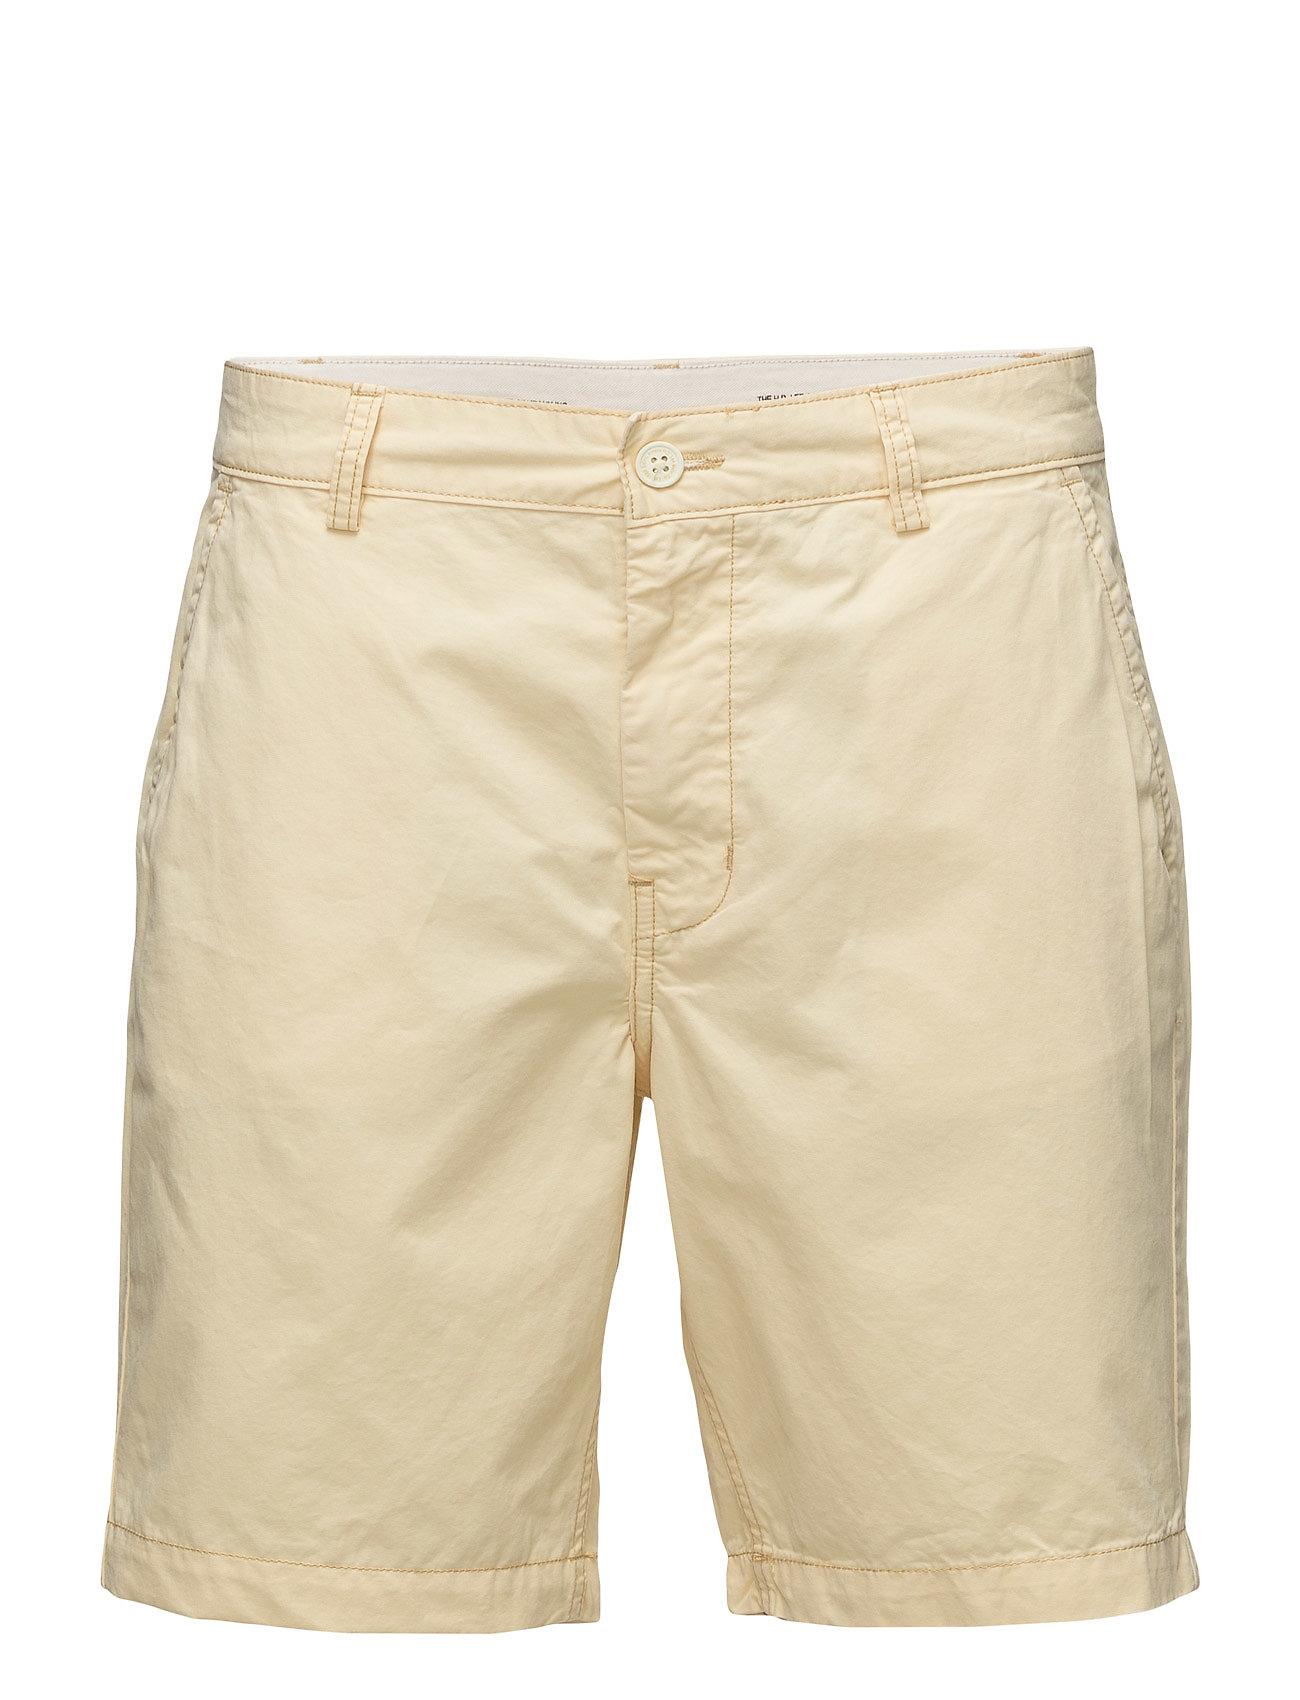 Chino Short Yellow Lee Jeans Bermuda Shorts til  - MoteJakten